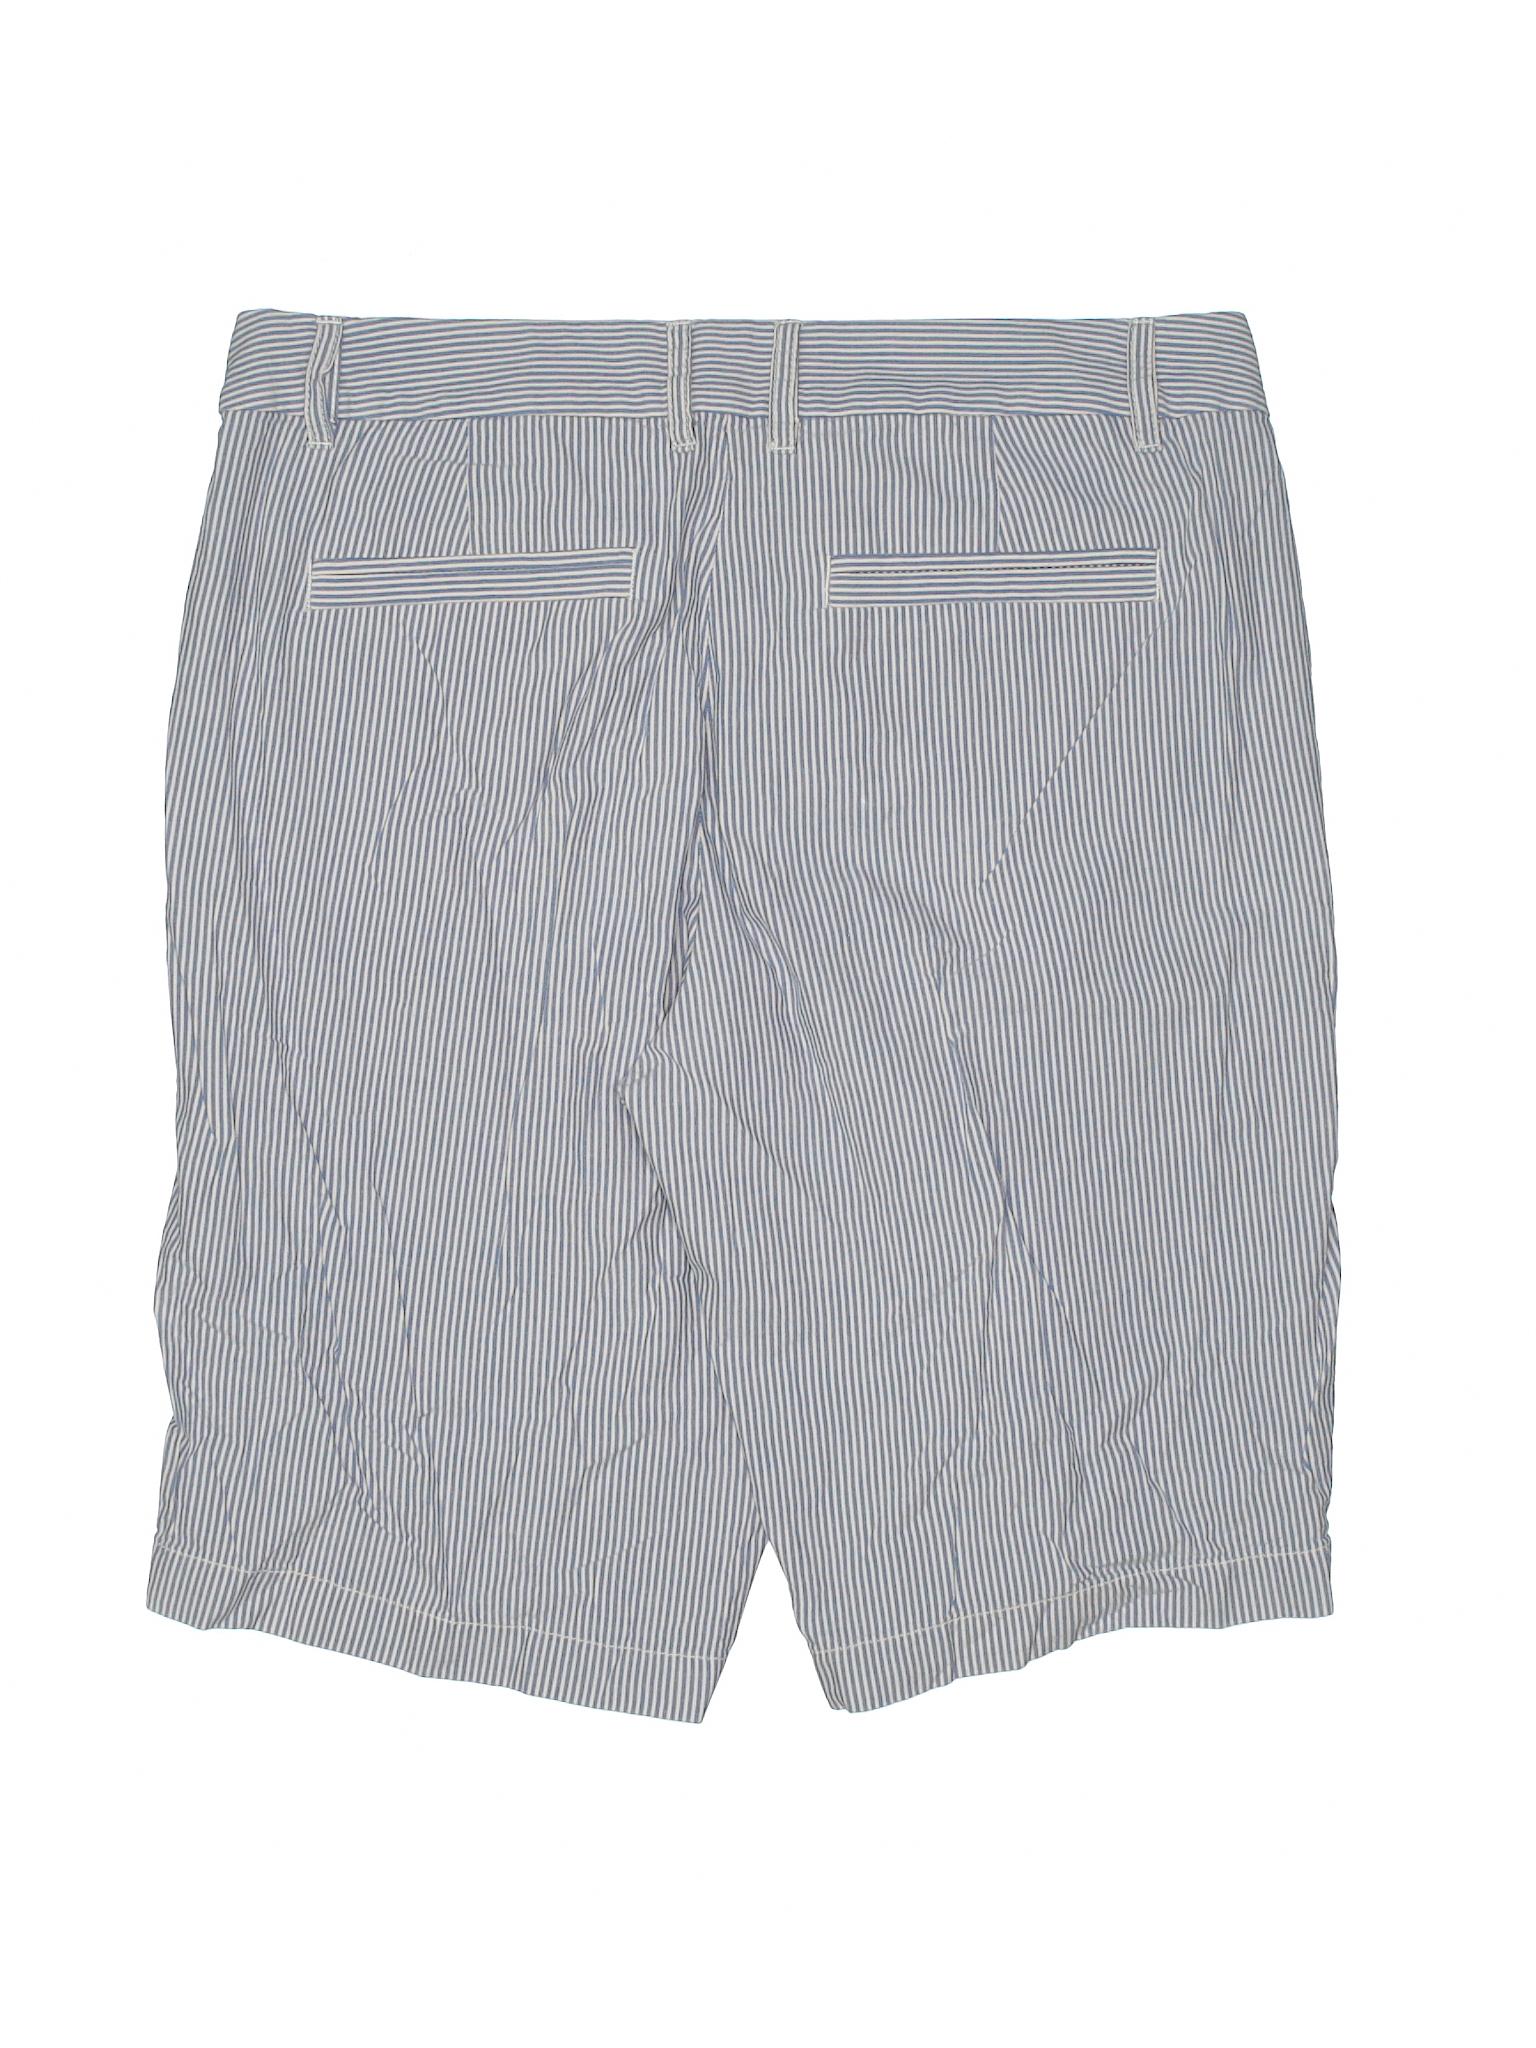 winter Boutique Khaki J Crew Shorts wRgqZ1Pg